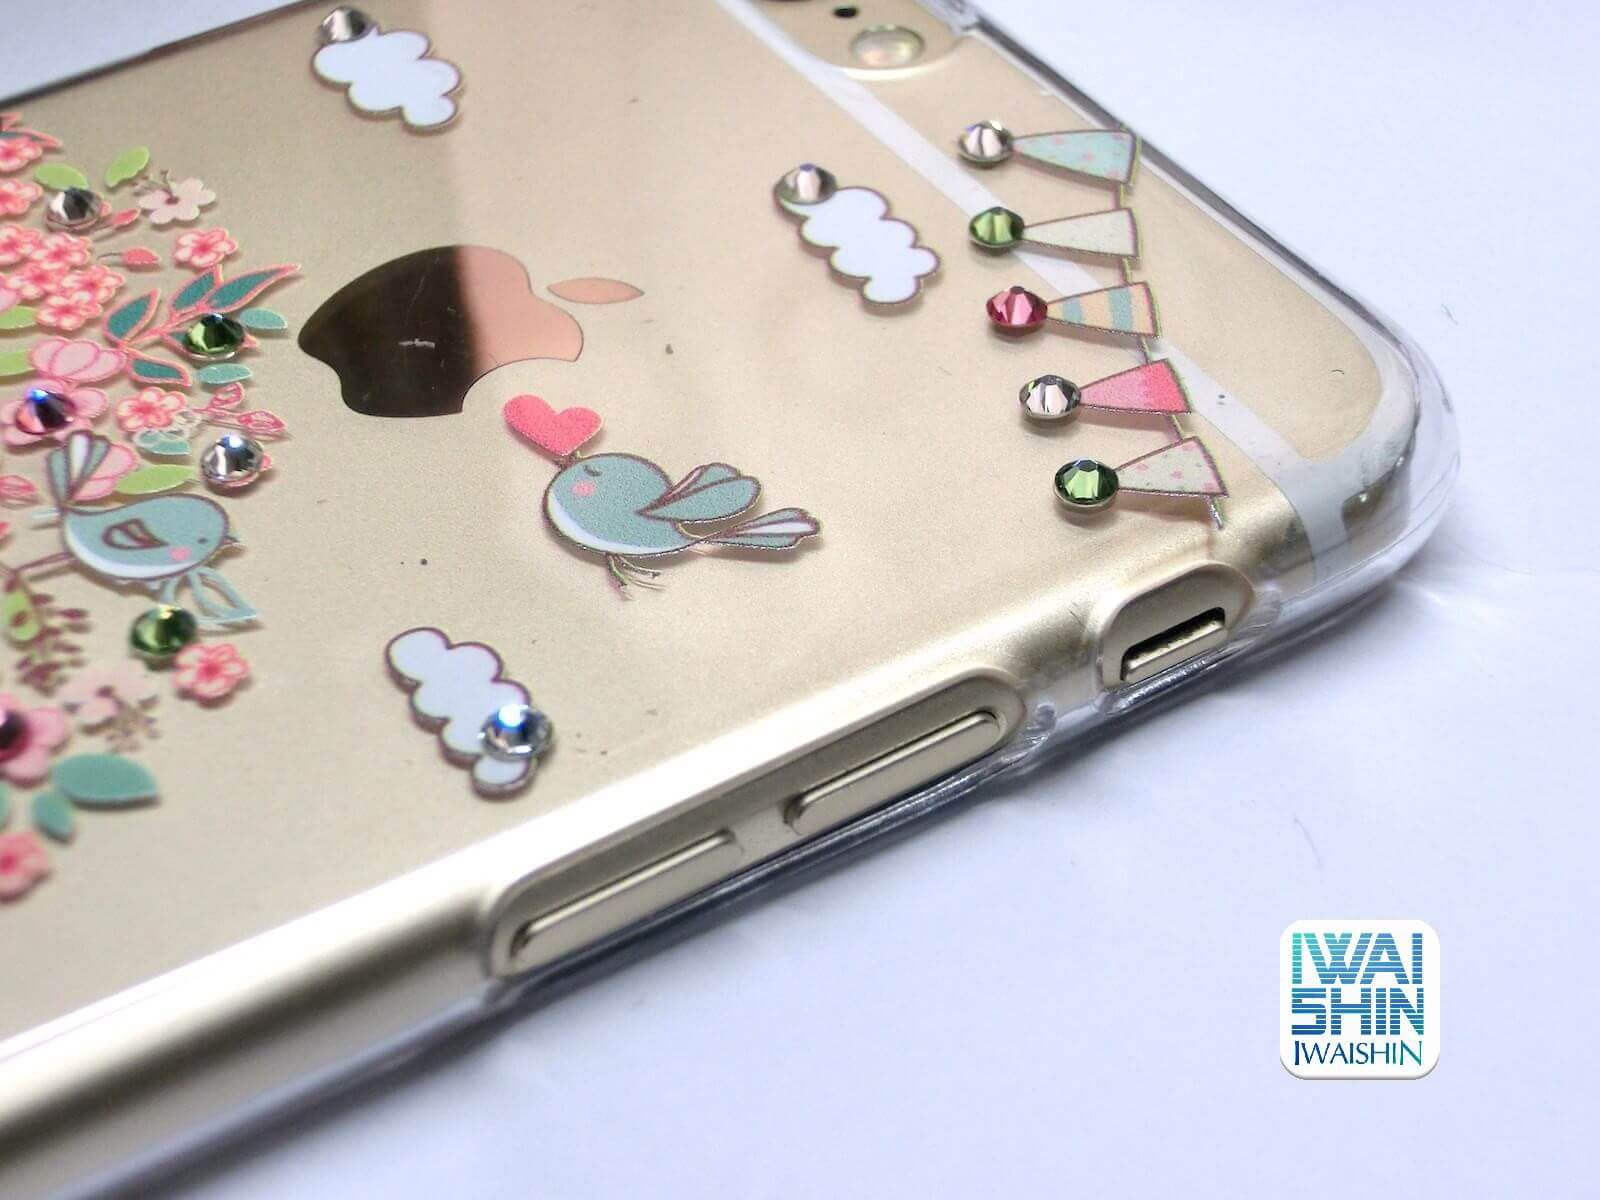 APBS 施華洛世奇 IPhone 6 保護殼5747